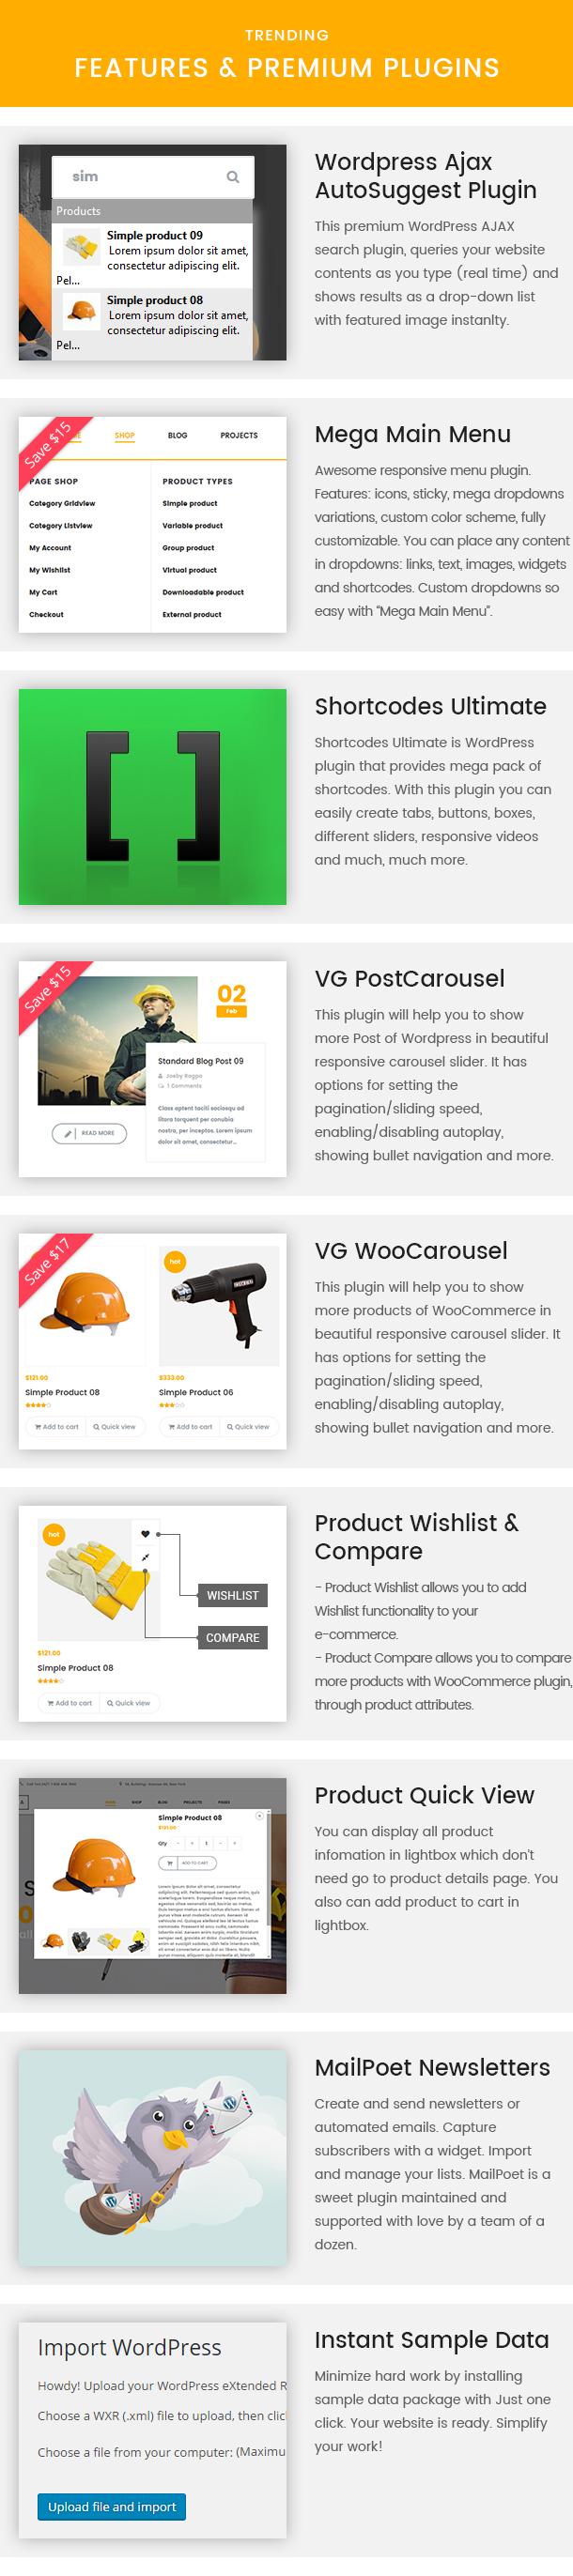 VG Ribona - WordPress Theme for Construction, Building Business - 51